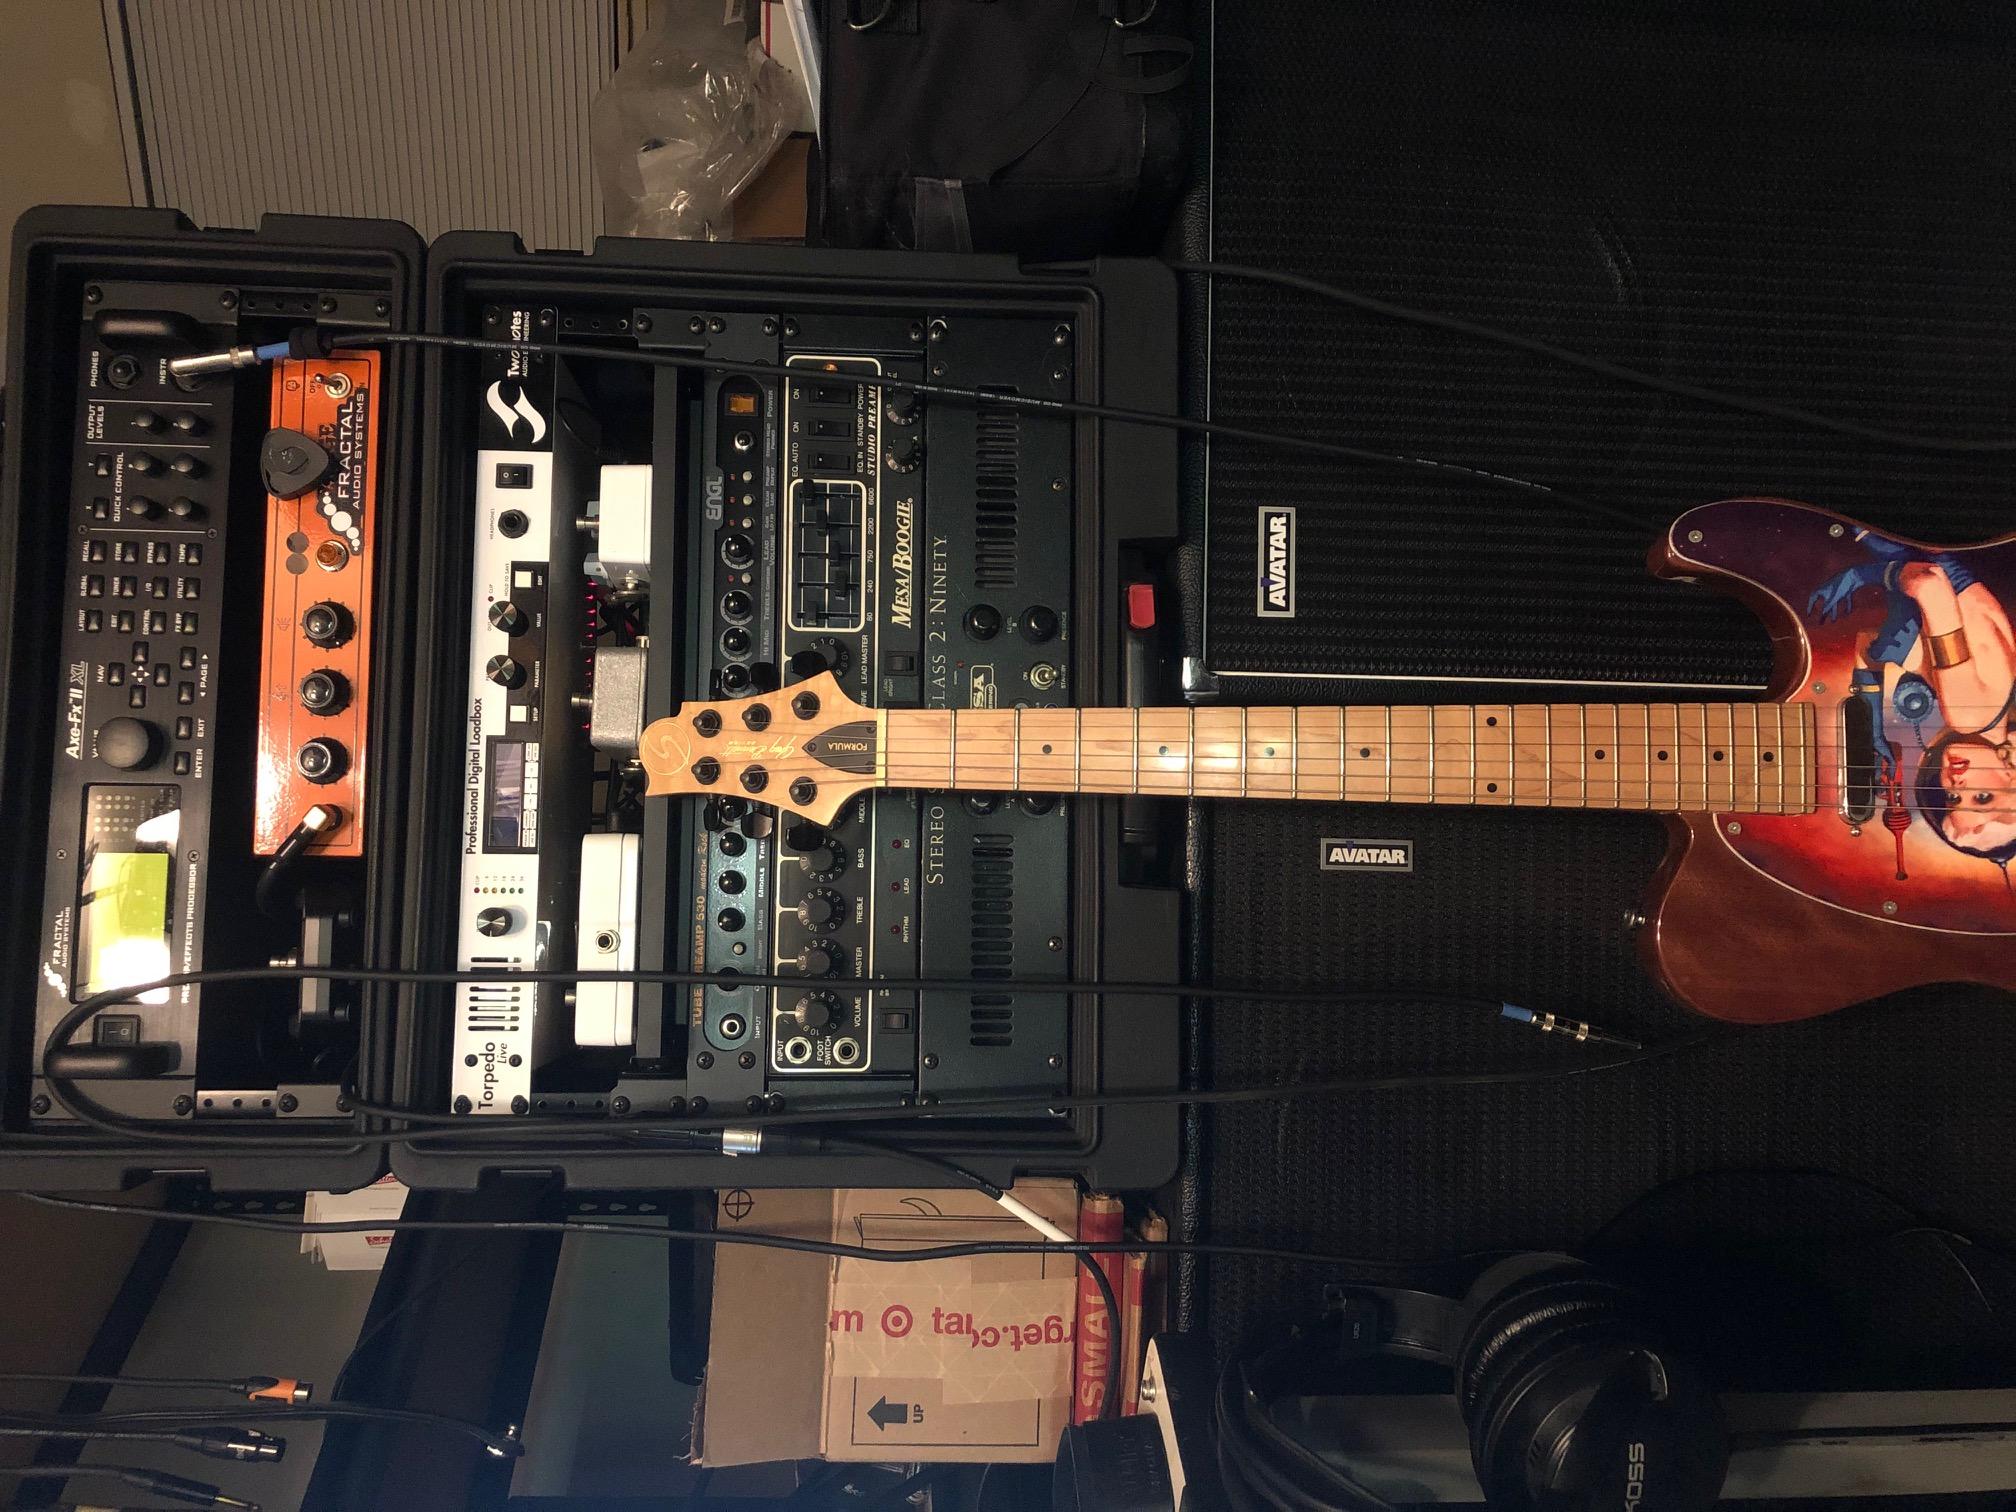 behringer pedals-img_6712-jpg